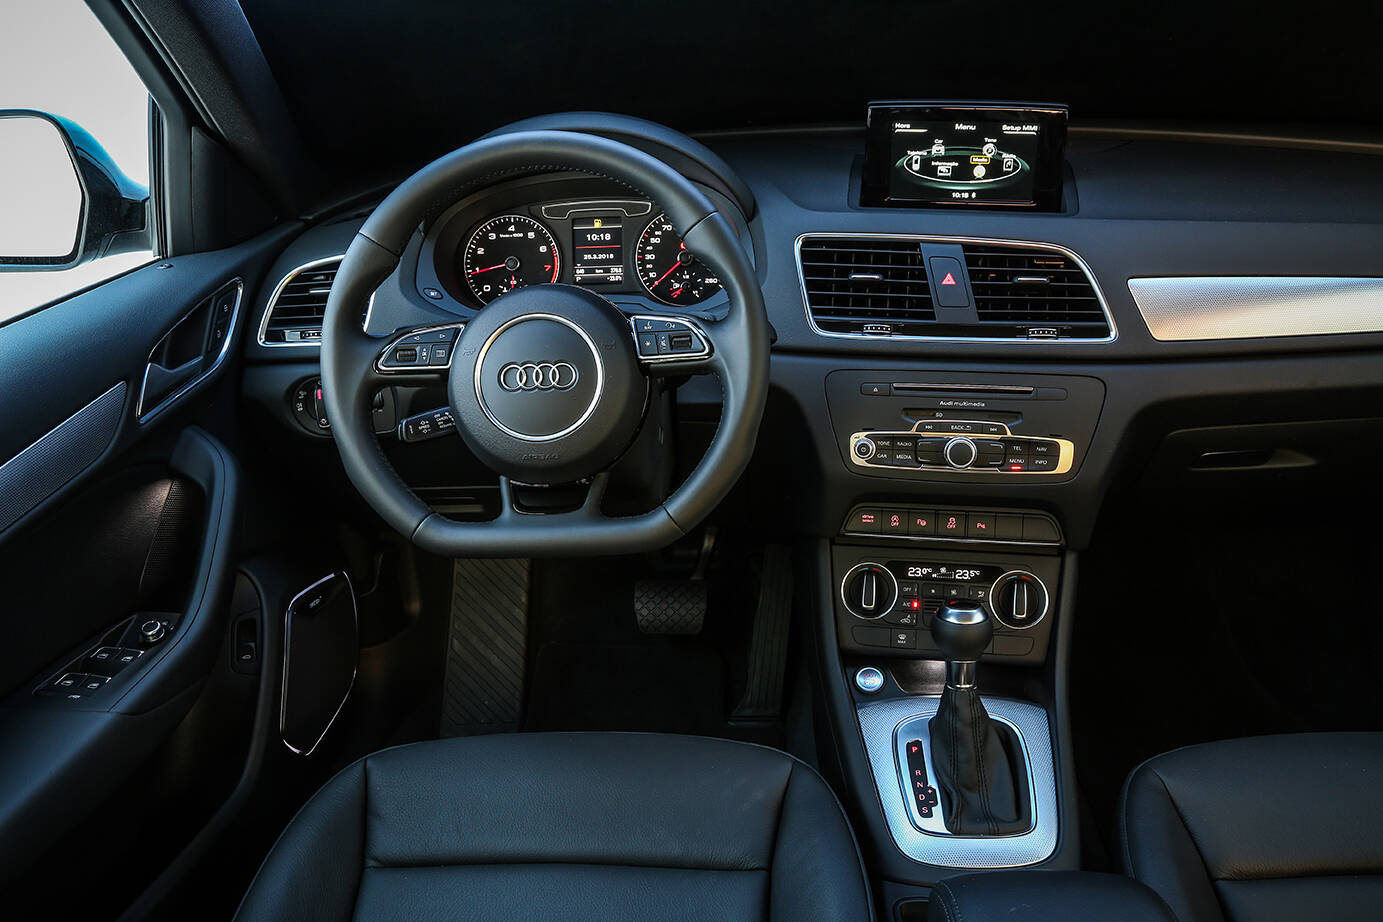 Audi Q3 Black Edition. Foto: Divulgação